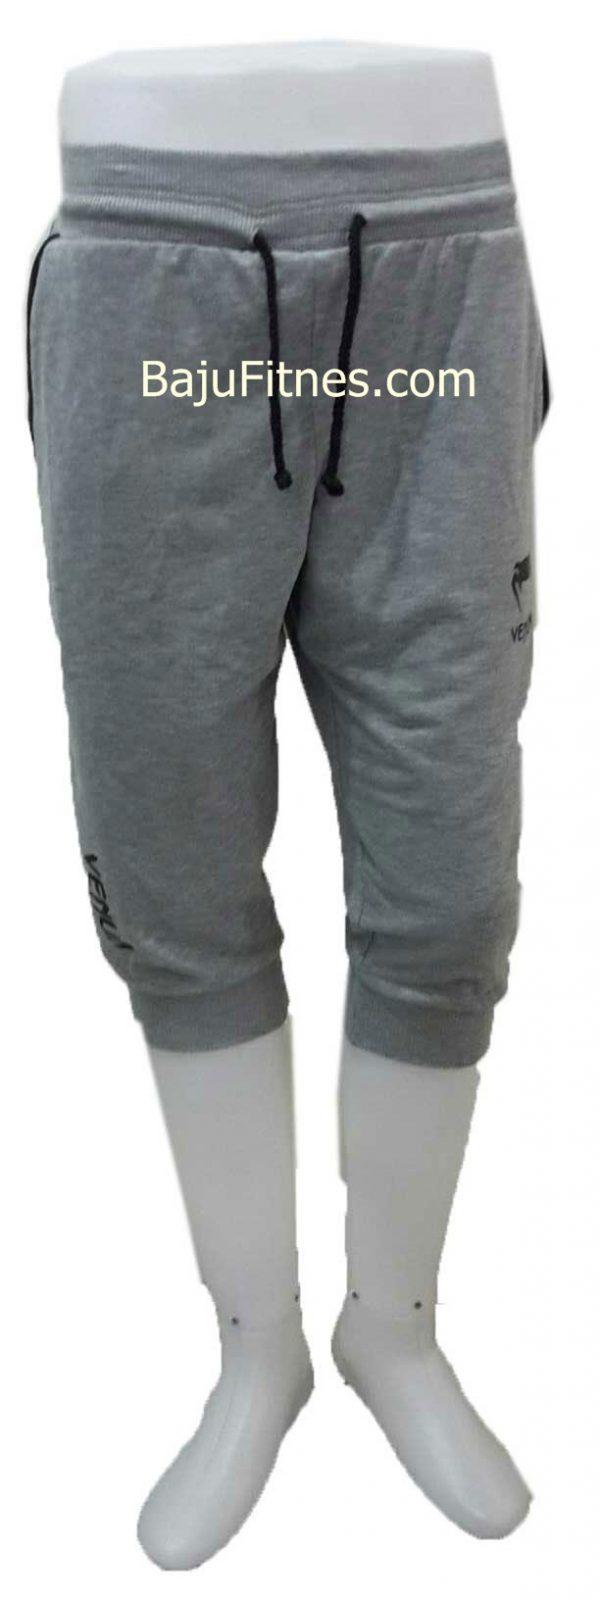 089506541896 Tri | 3244-harga-celana-fitness-priakeren